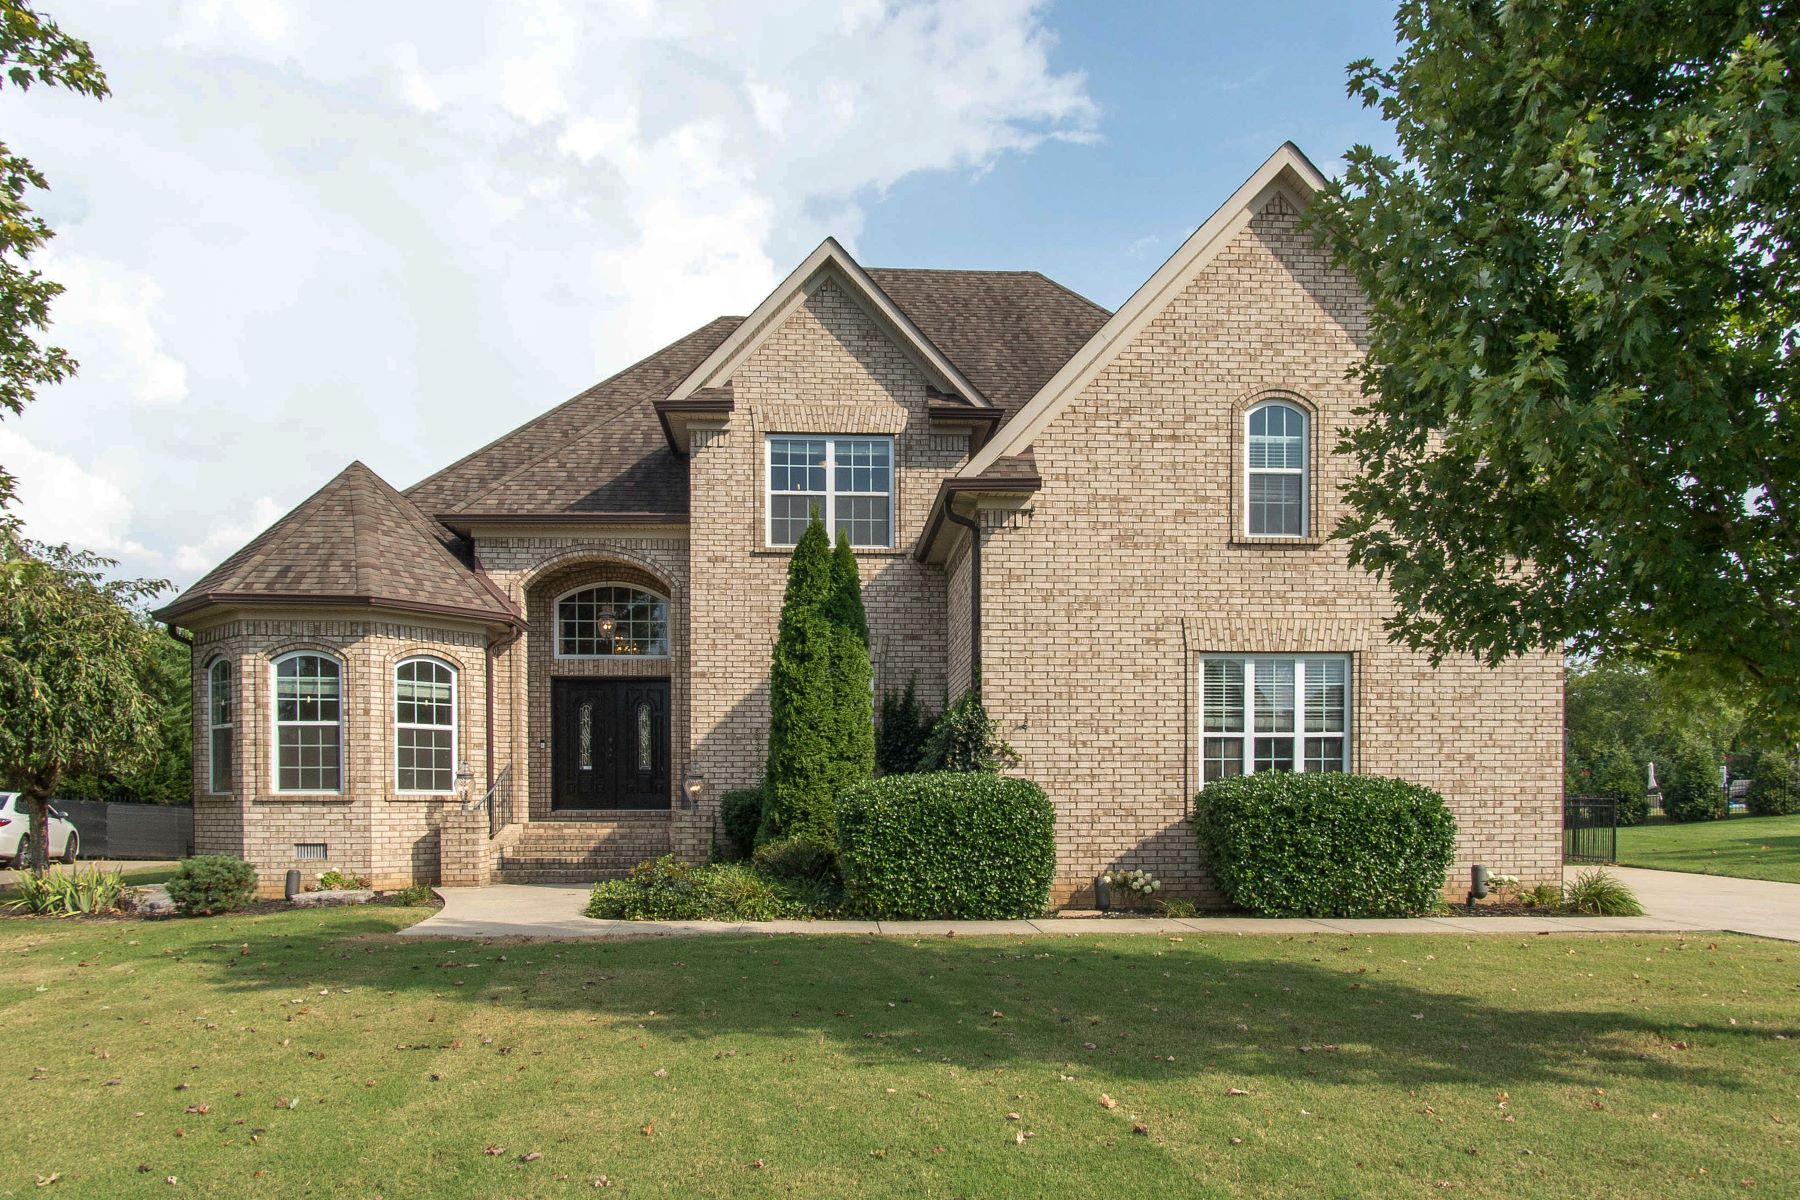 Single Family Homes для того Продажа на 106 Tambark Circle Murfreesboro, Теннесси 37128 Соединенные Штаты